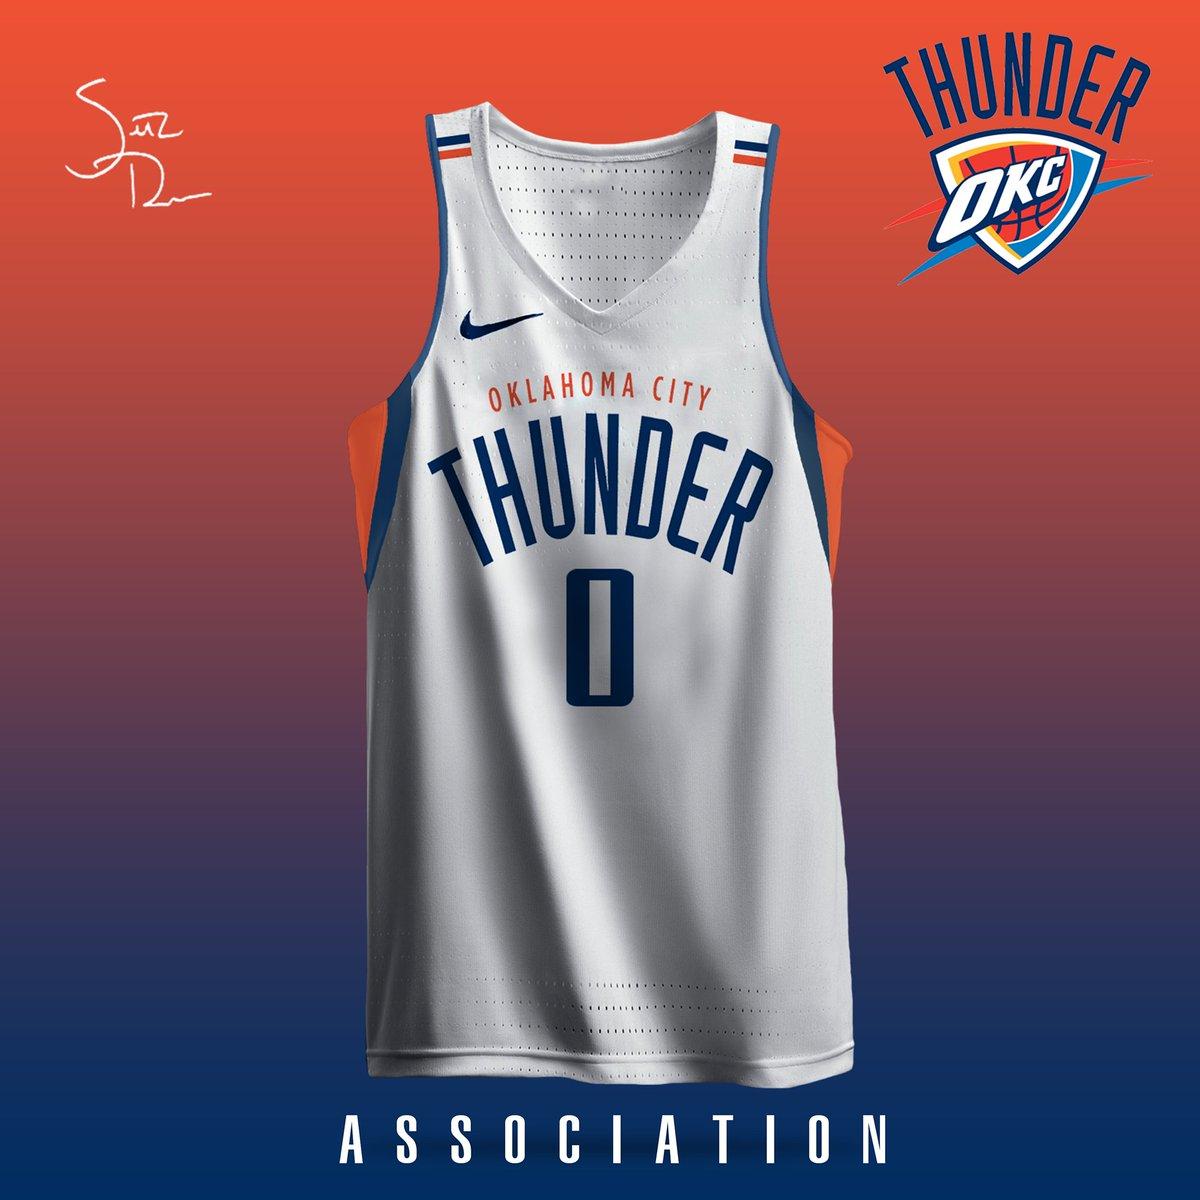 c728db5248e Up The Thunder on Twitter